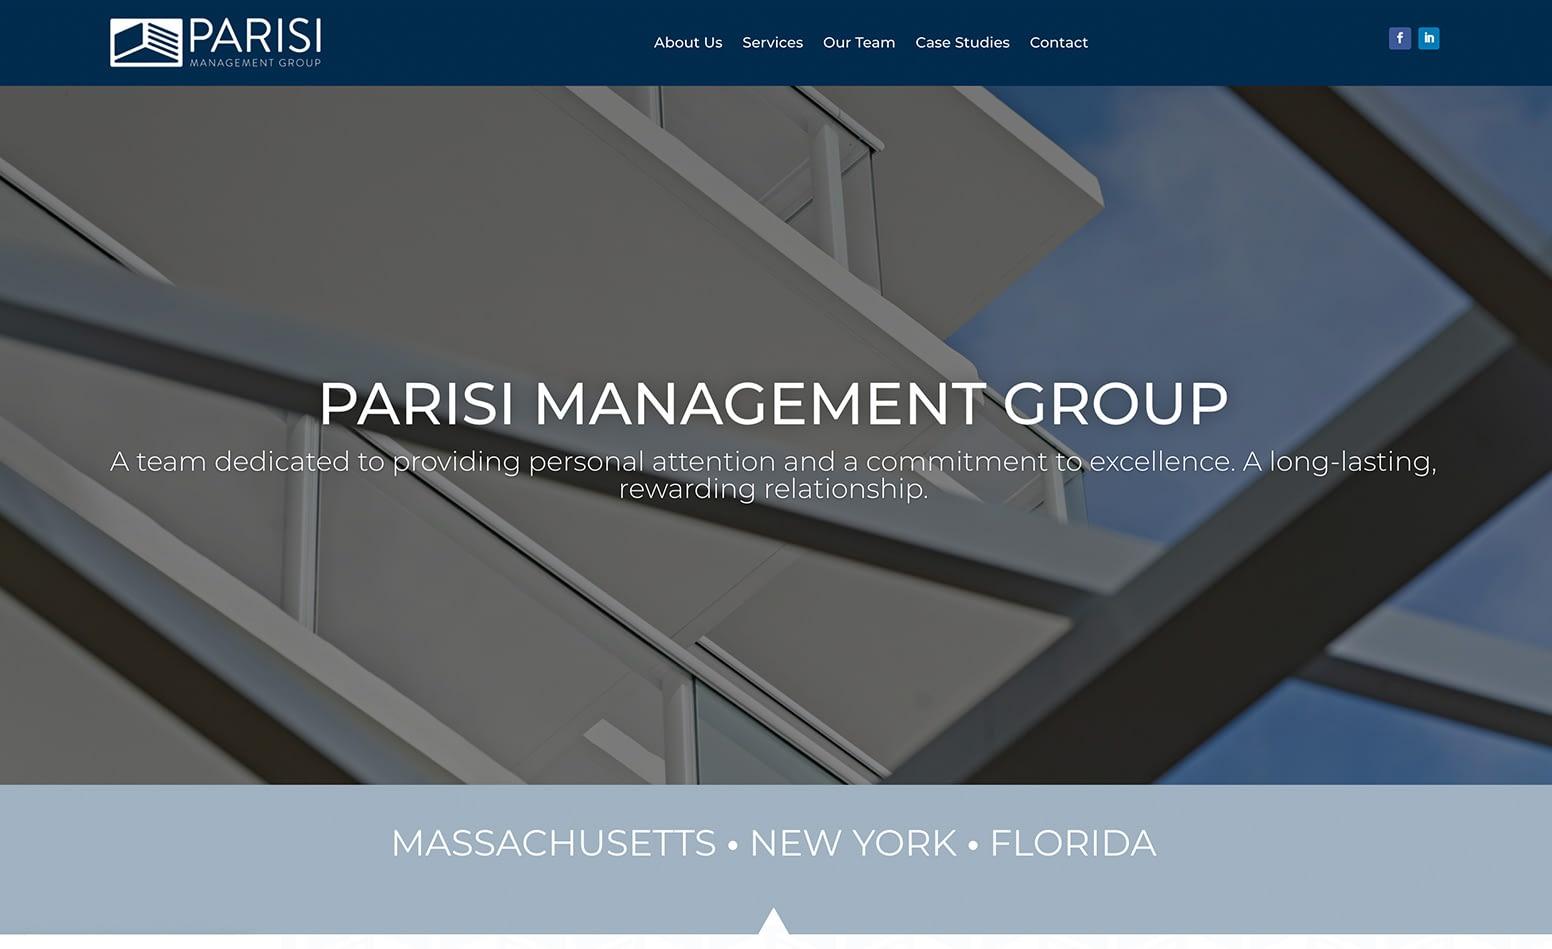 Parisi Management Group website, custom website design Western MA, website development Northern CT, marketing agency Massachusetts